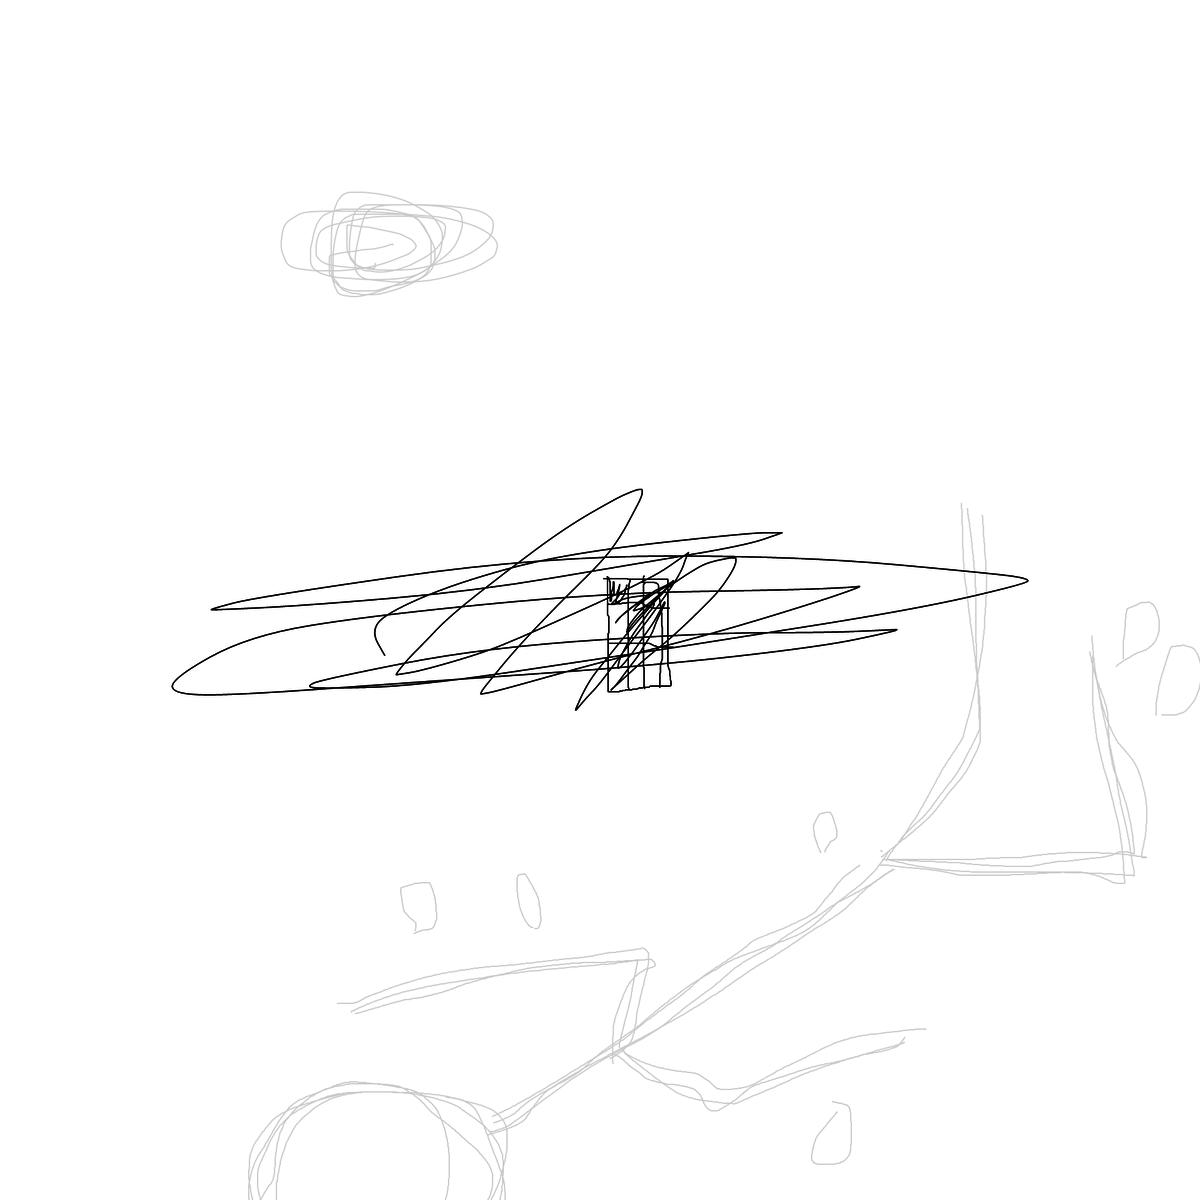 BAAAM drawing#18679 lat:45.5558471679687500lng: -73.6644287109375000